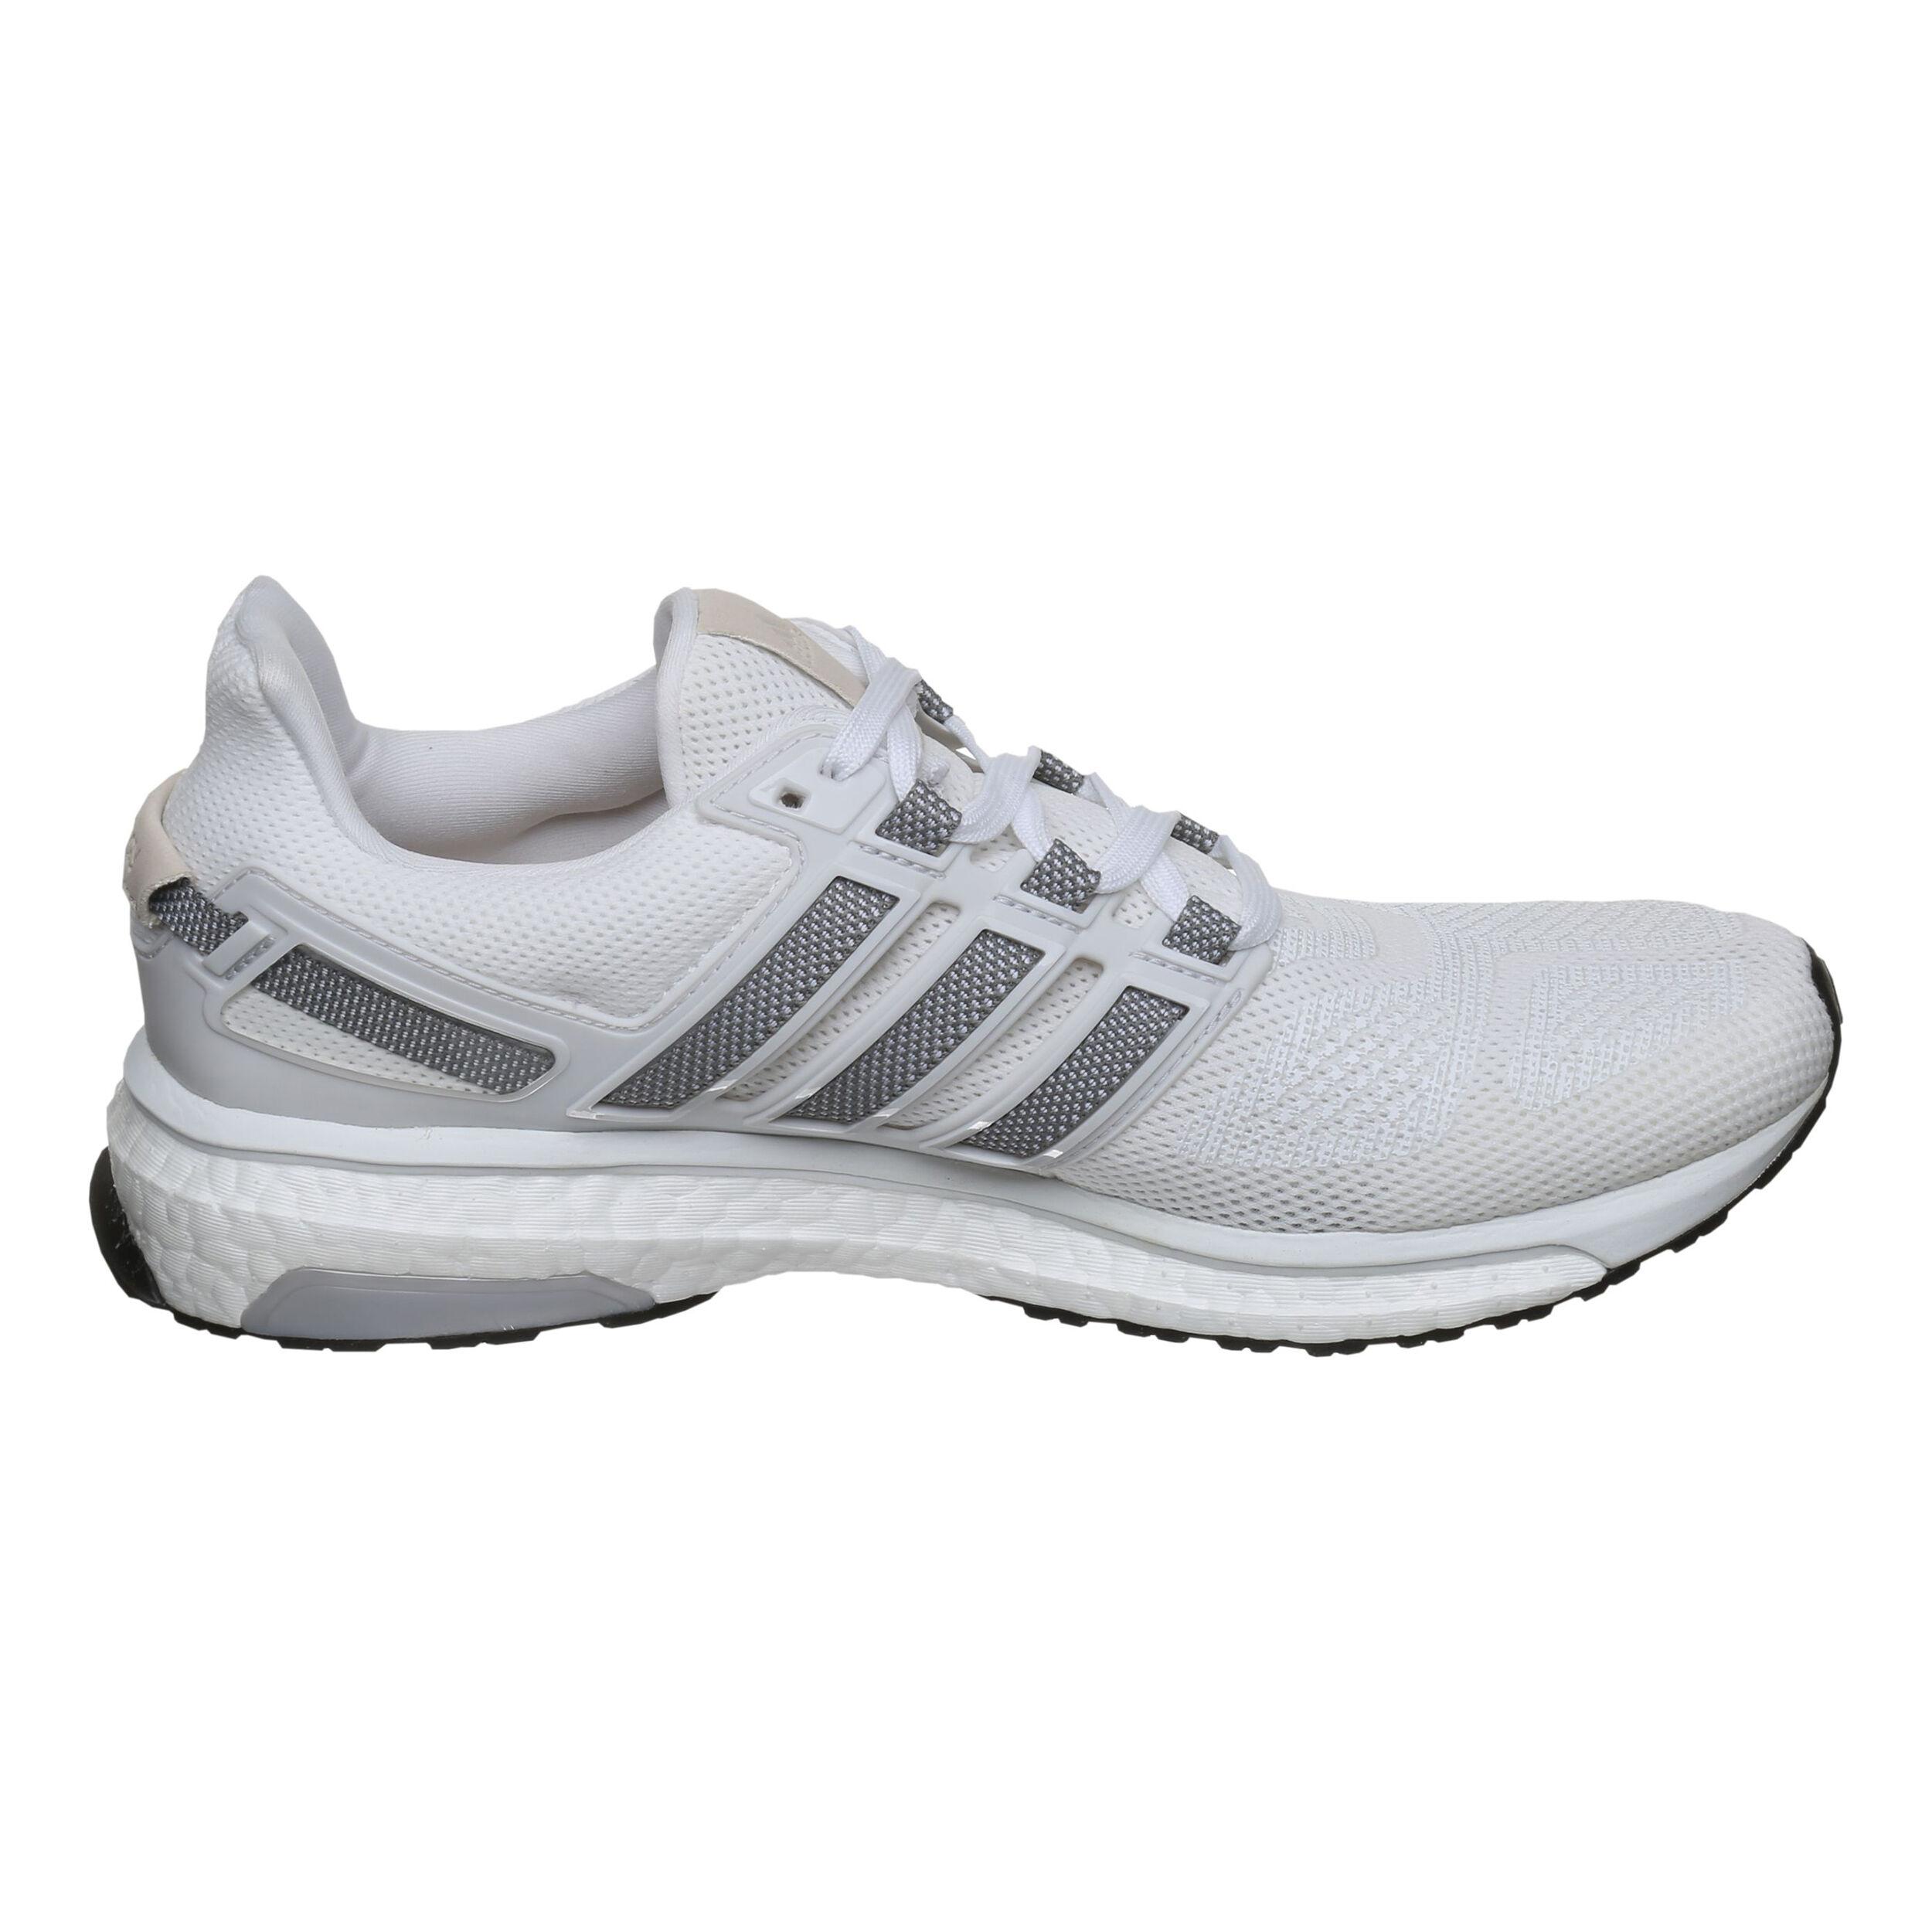 adidas Energy Boost 3 Neutralschuh Damen Weiß, Grau online